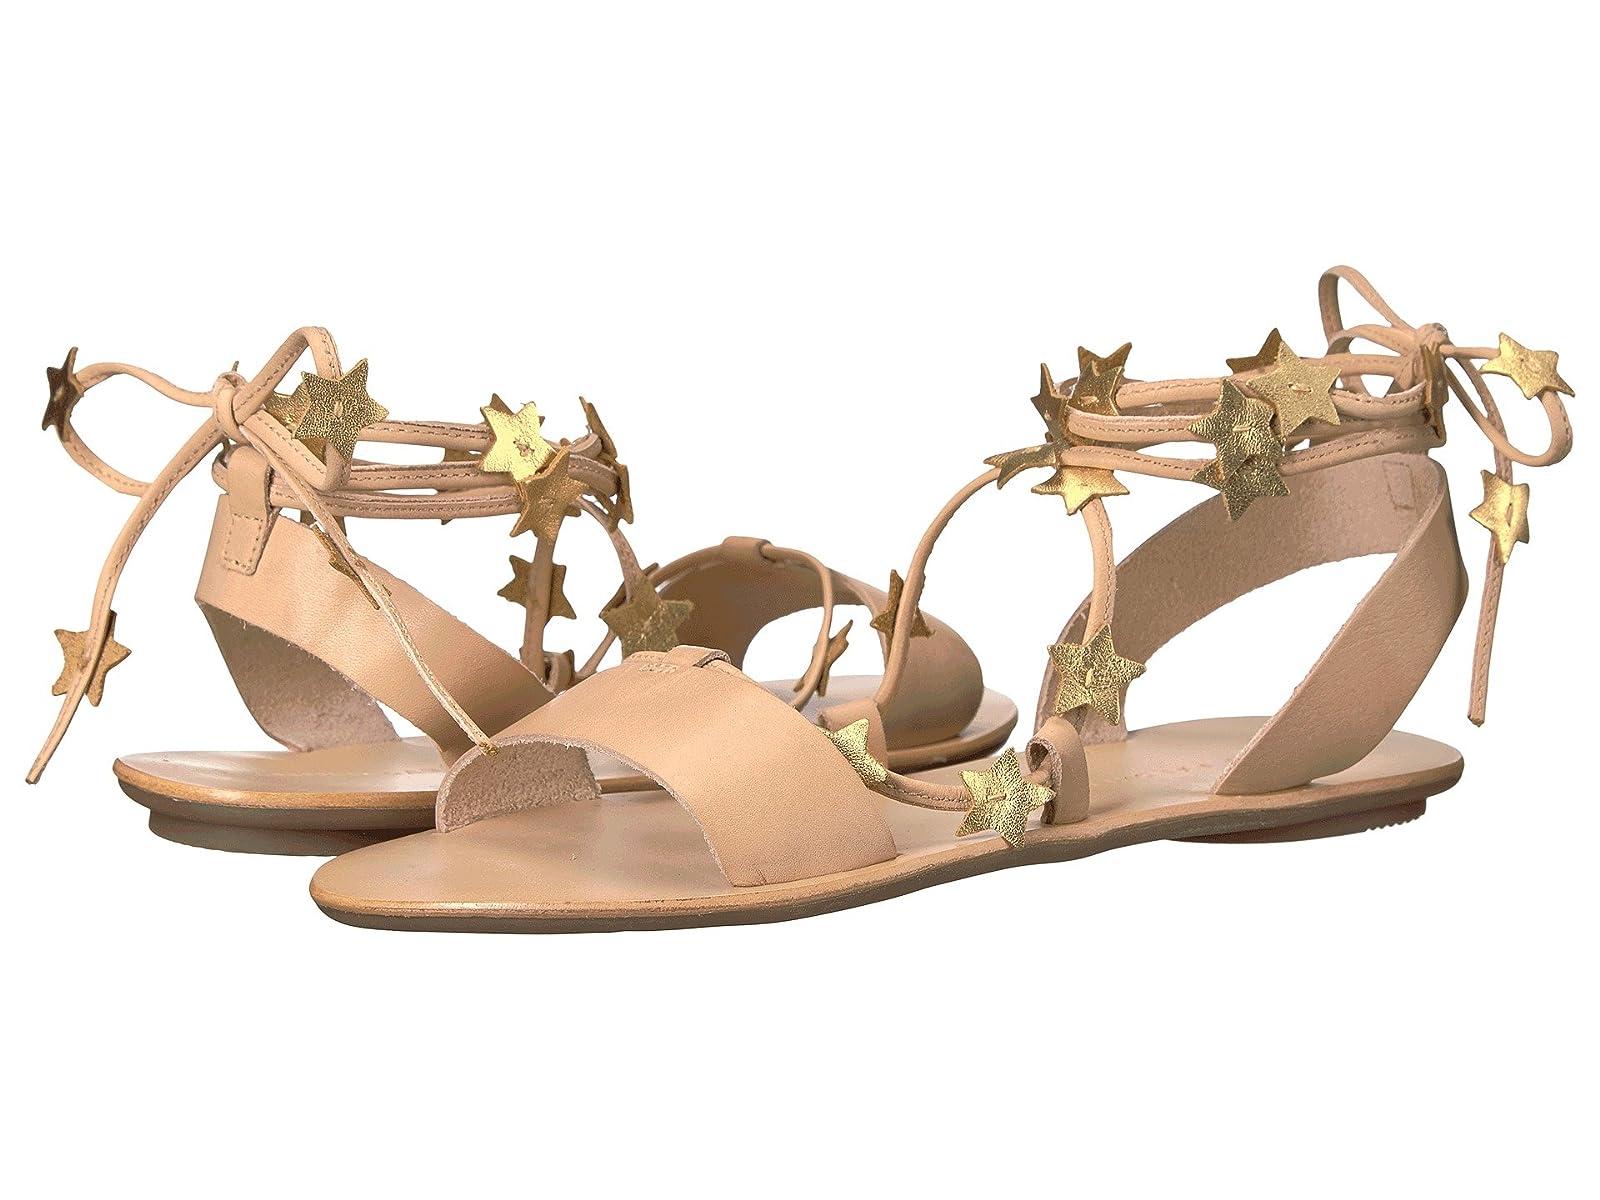 Loeffler Randall StarlaAtmospheric grades have affordable shoes